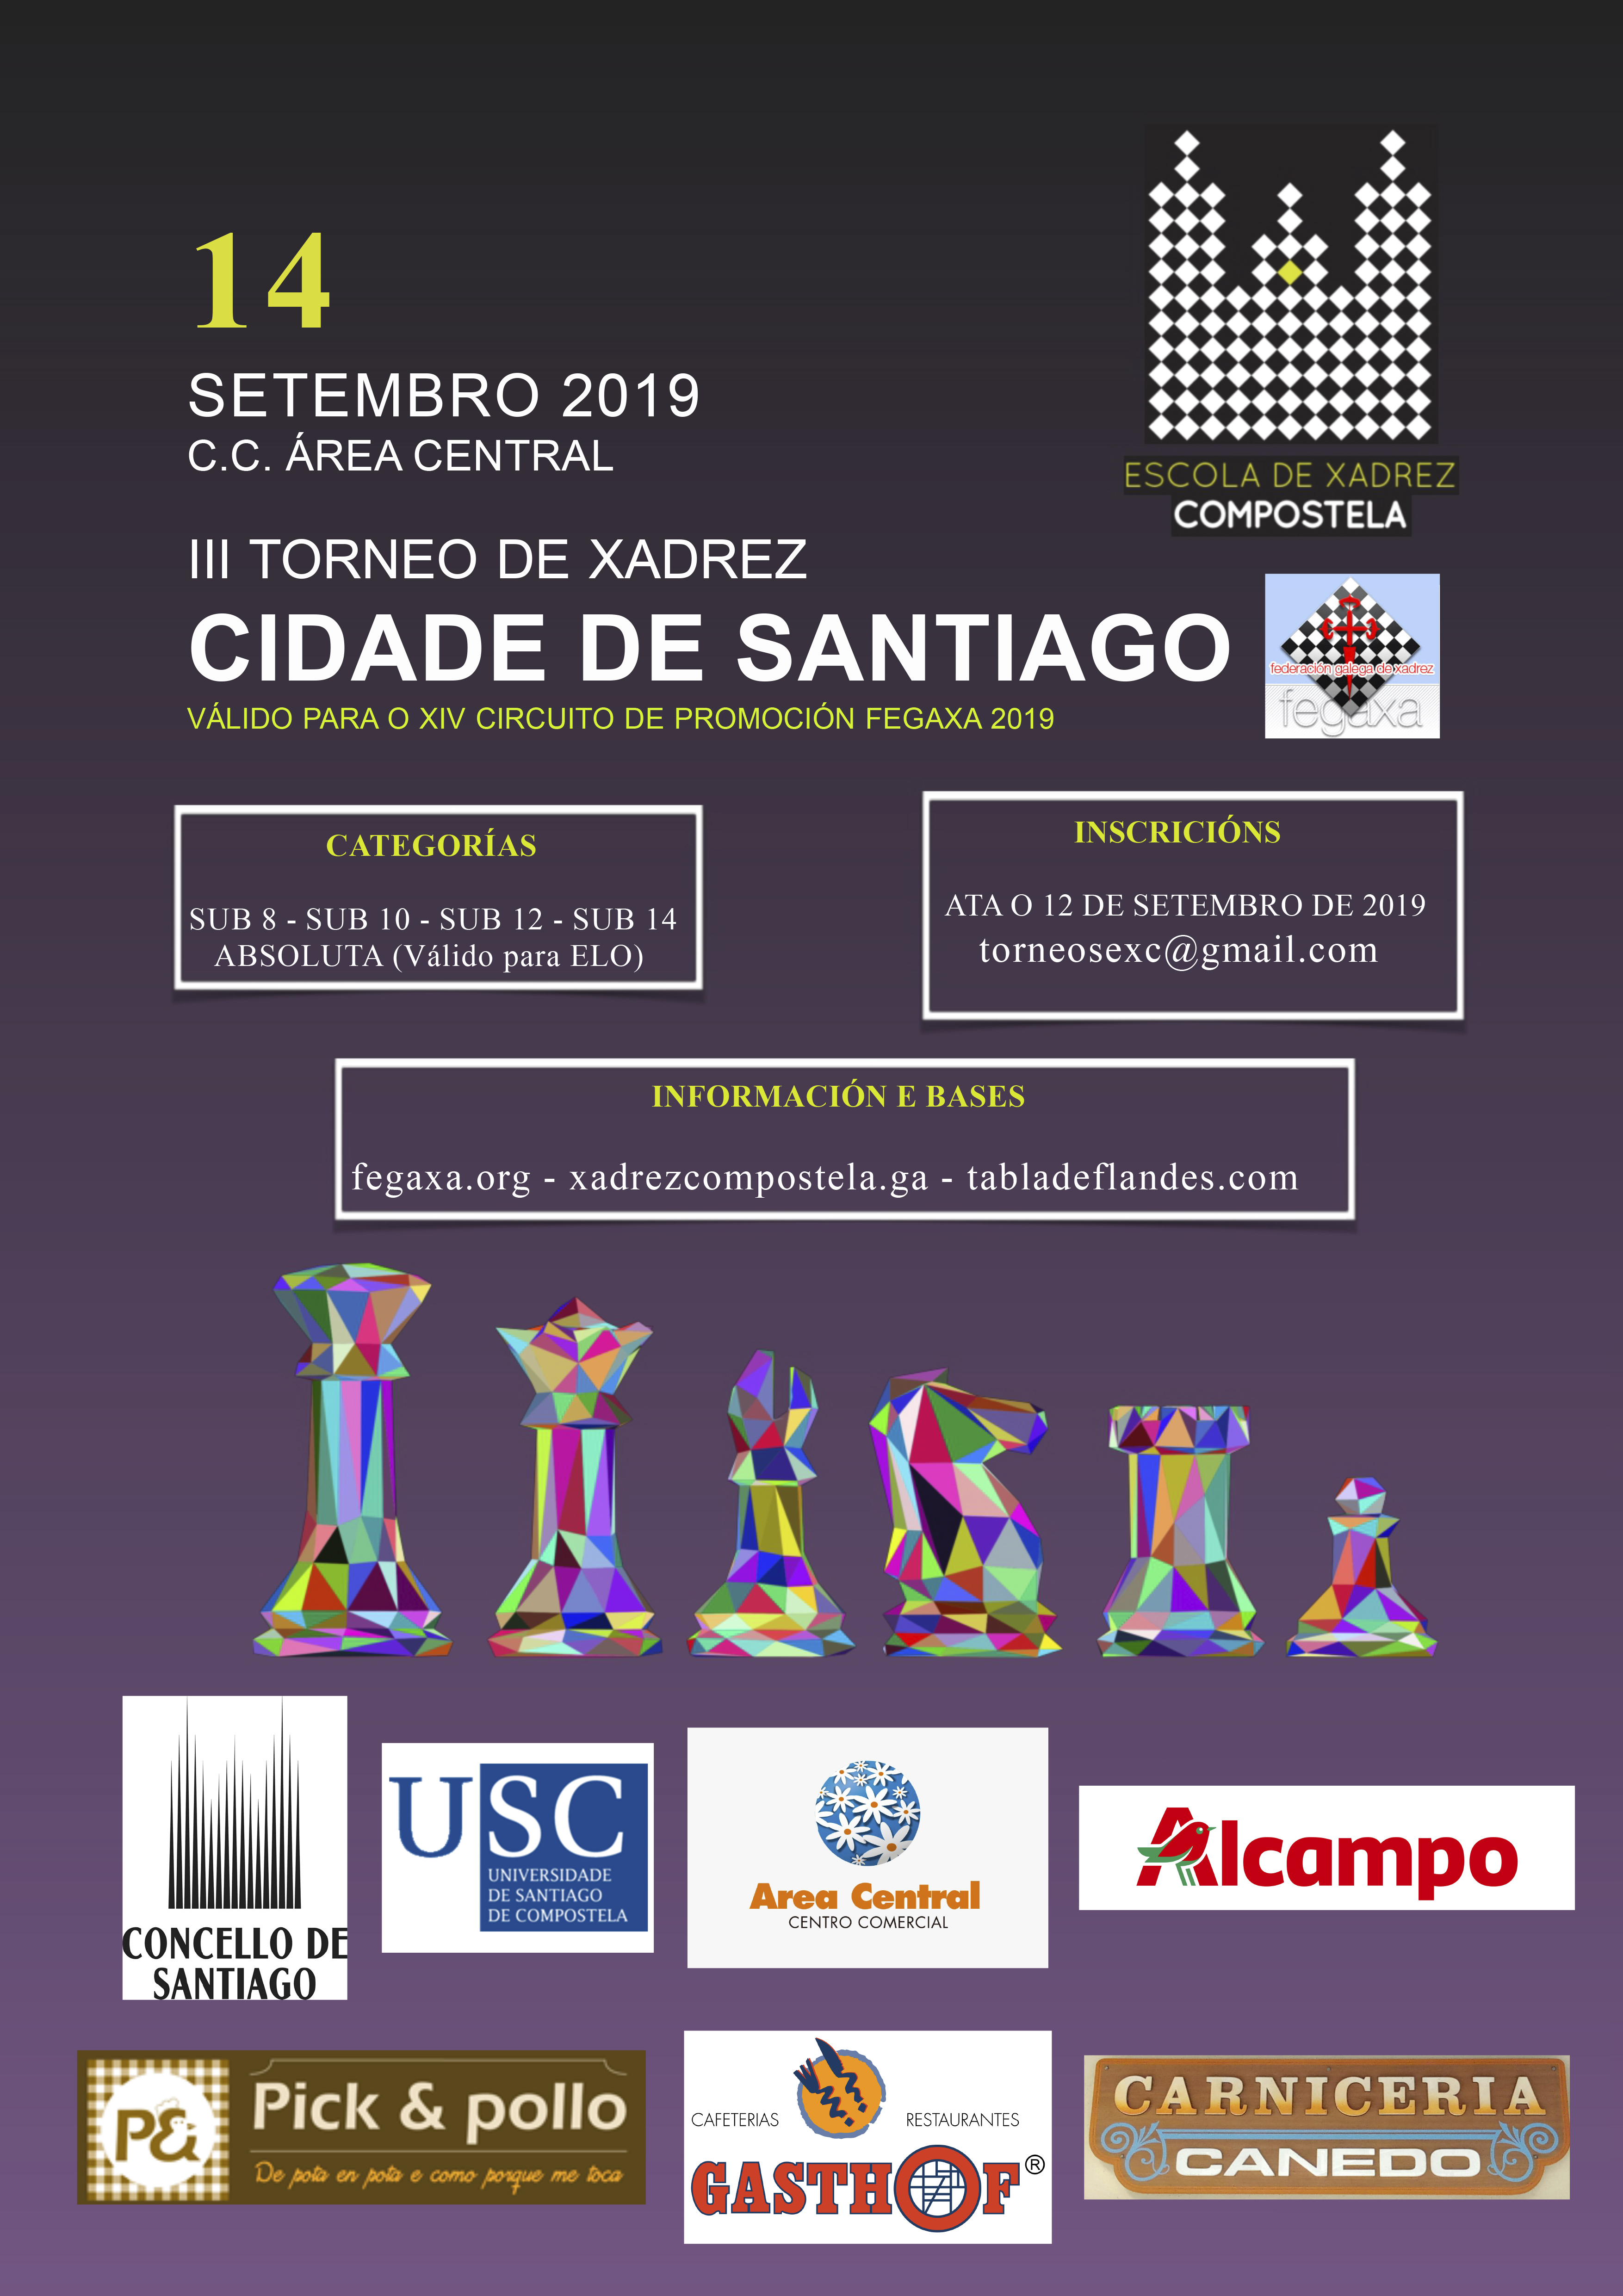 III Torneo de Xadrez Cidade de Santiago